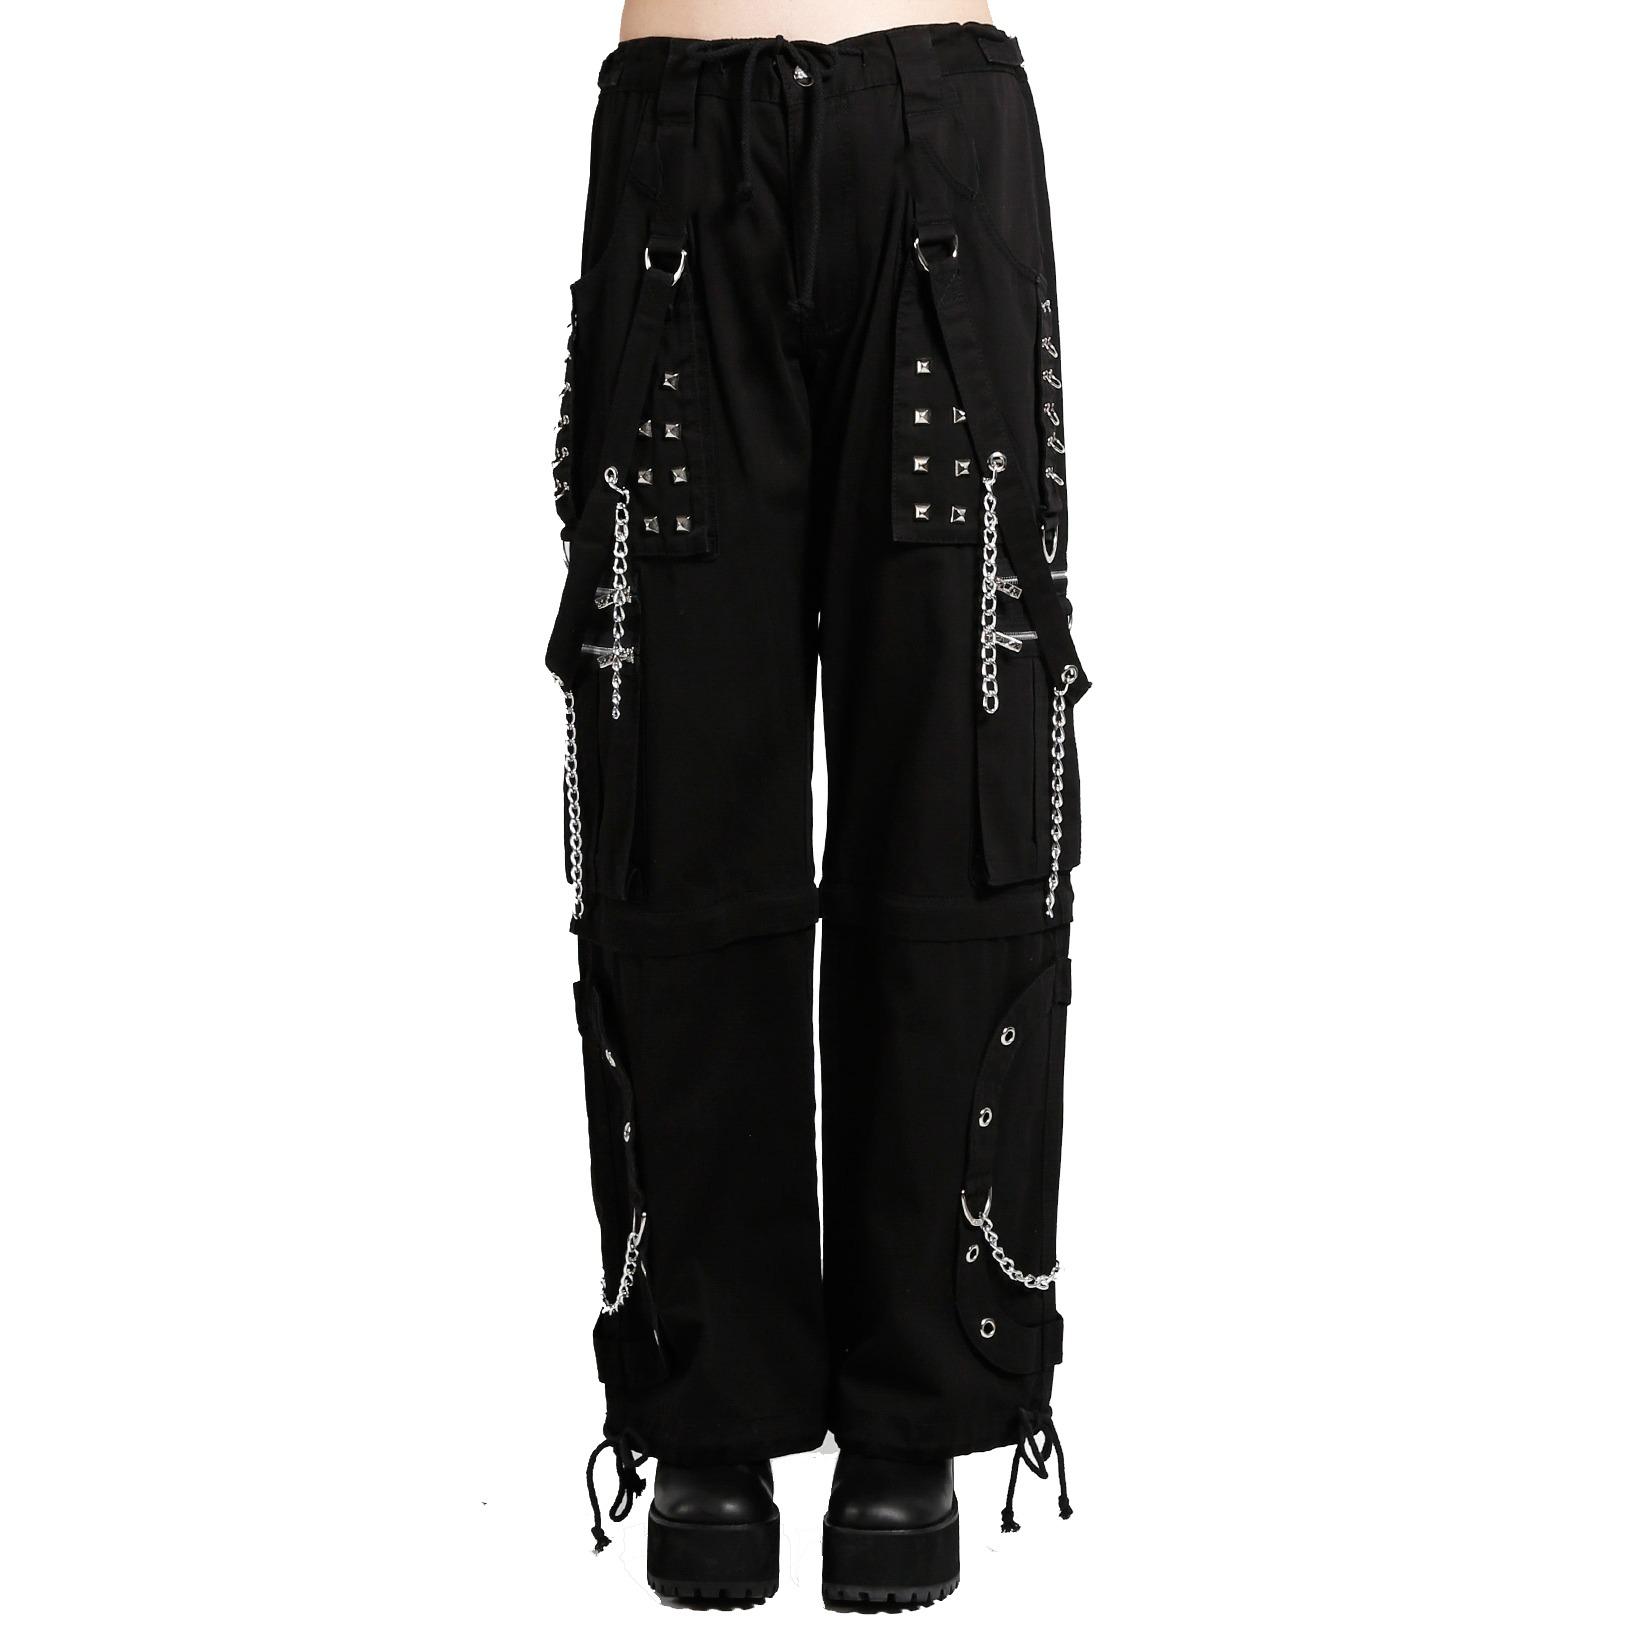 Prime Quality Women's Tripp Electro Black Bondage Rave Gothic Cyber Chain Goth Jeans Punk Rock Pants